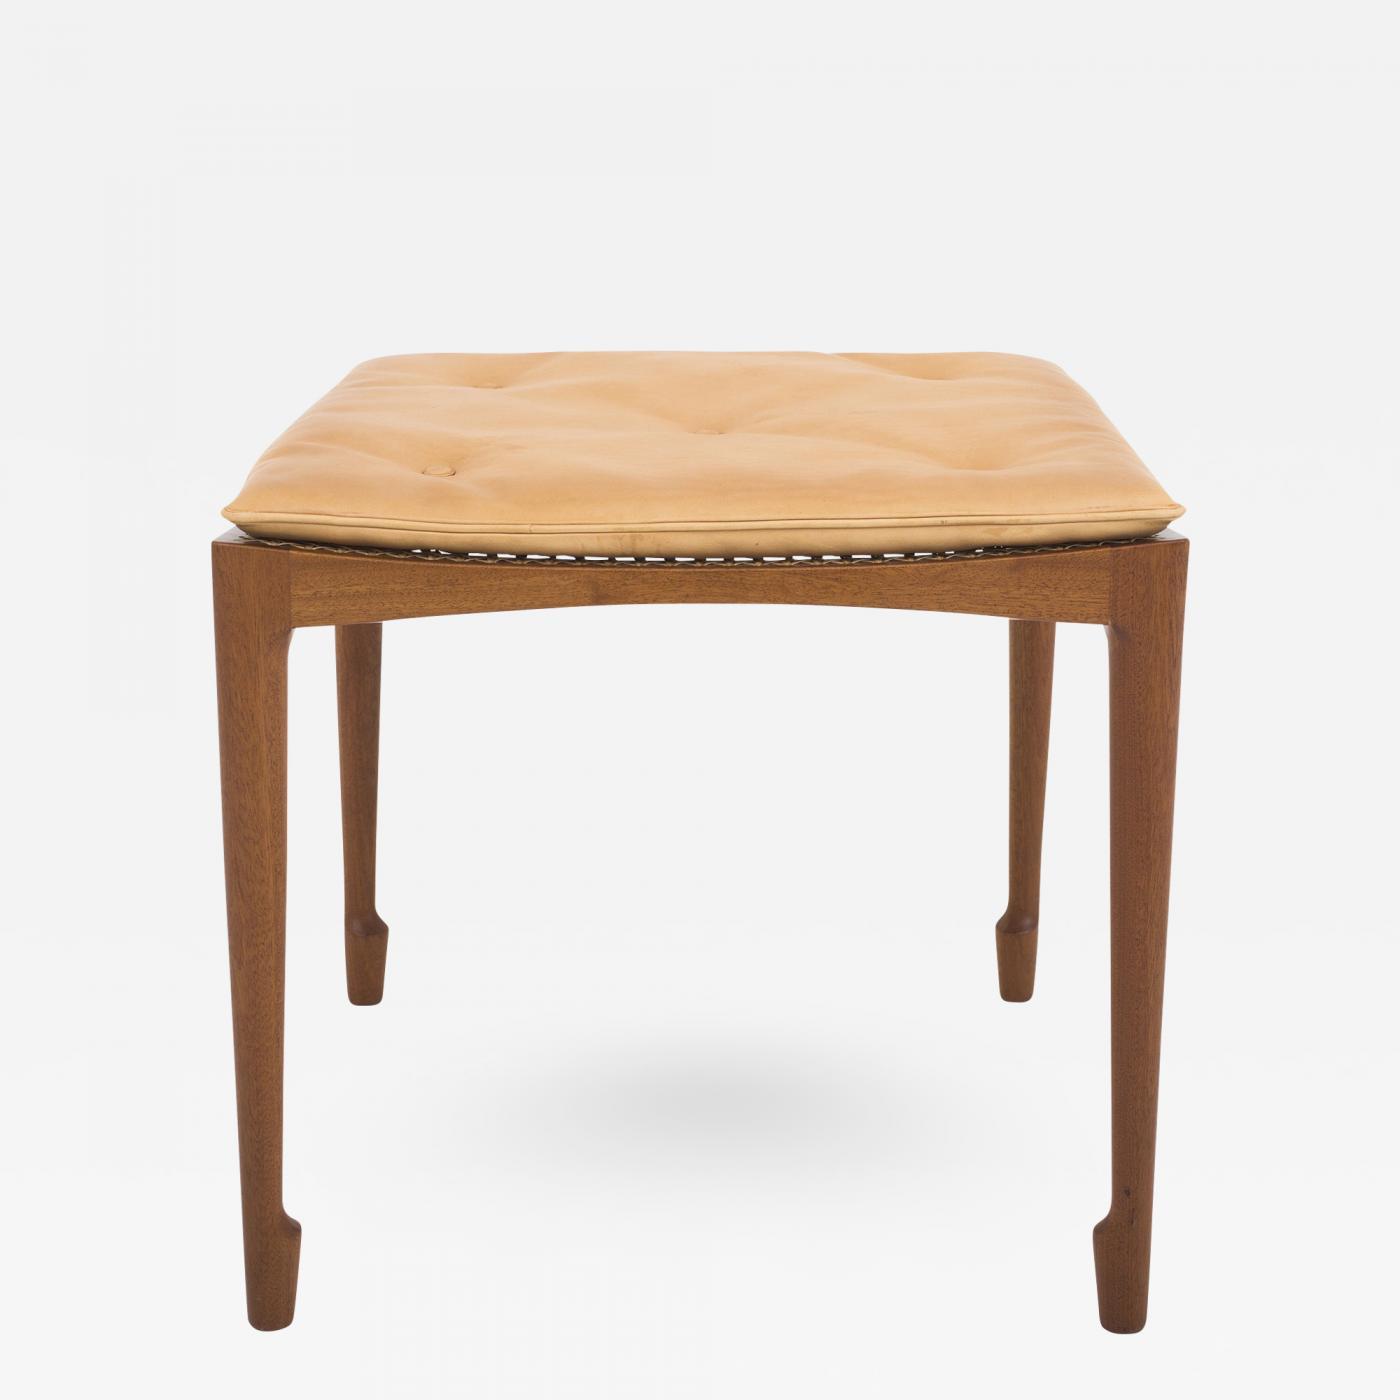 Listings / Furniture / Seating / Stools